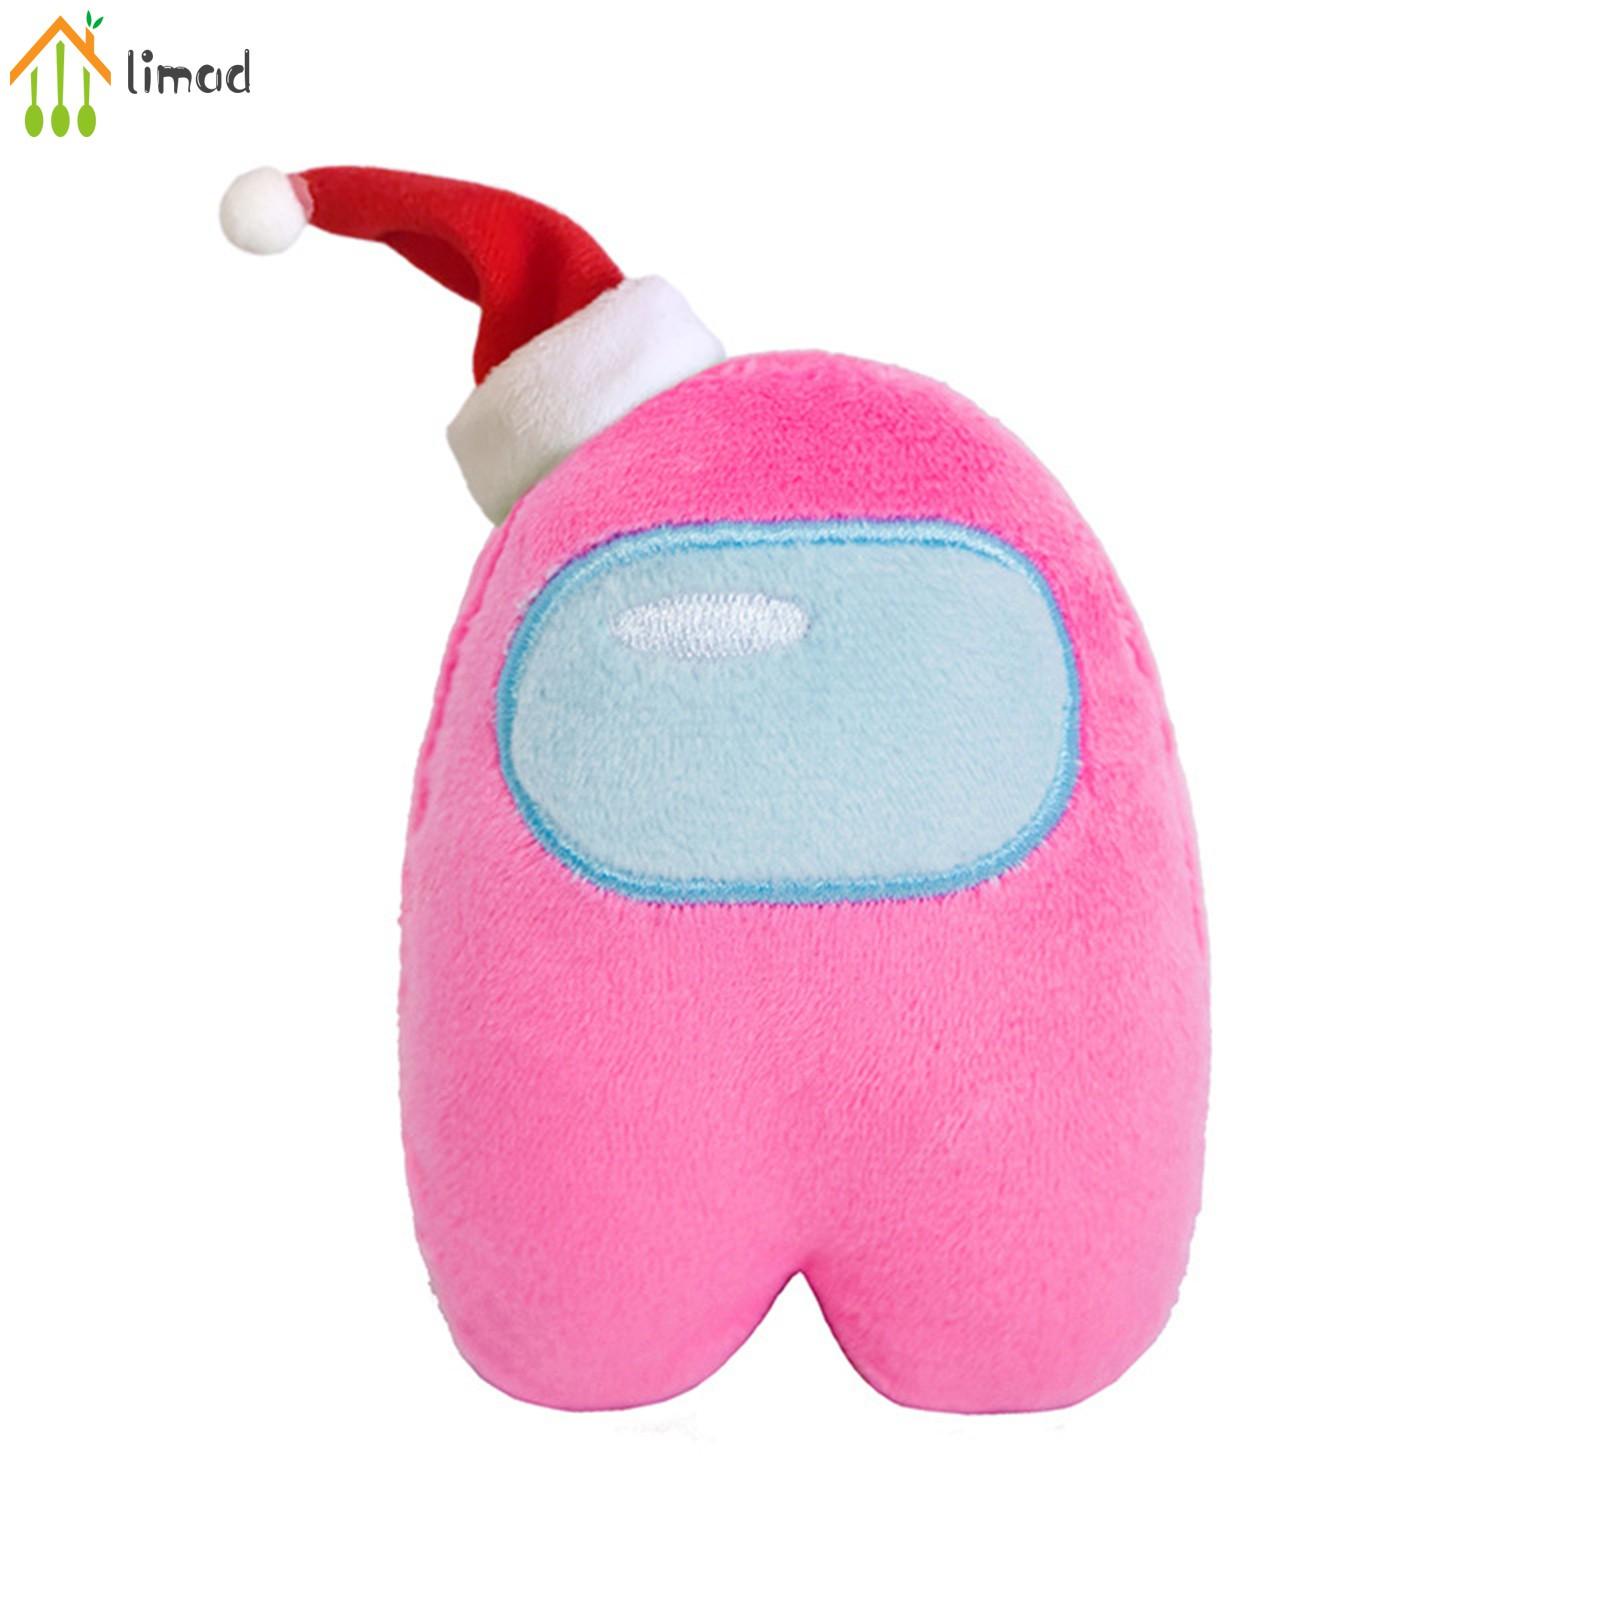 【COD】# limad Xmas Hat Figure Among Us Plush Crewmate Plushie Kawaii Stuffed Soft Game Plush Toy Lovely Stuffed Doll Christmas...